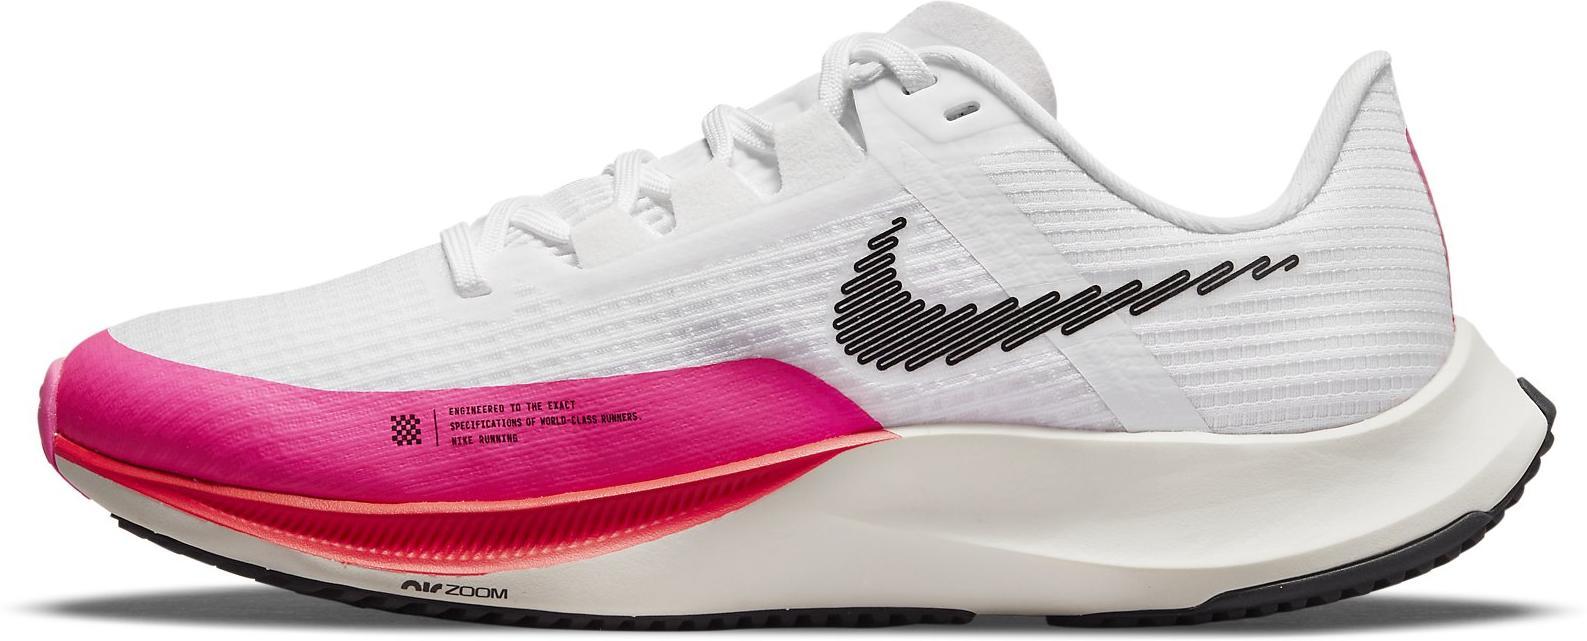 Zapatillas de running Nike Air Zoom Rival Fly 3